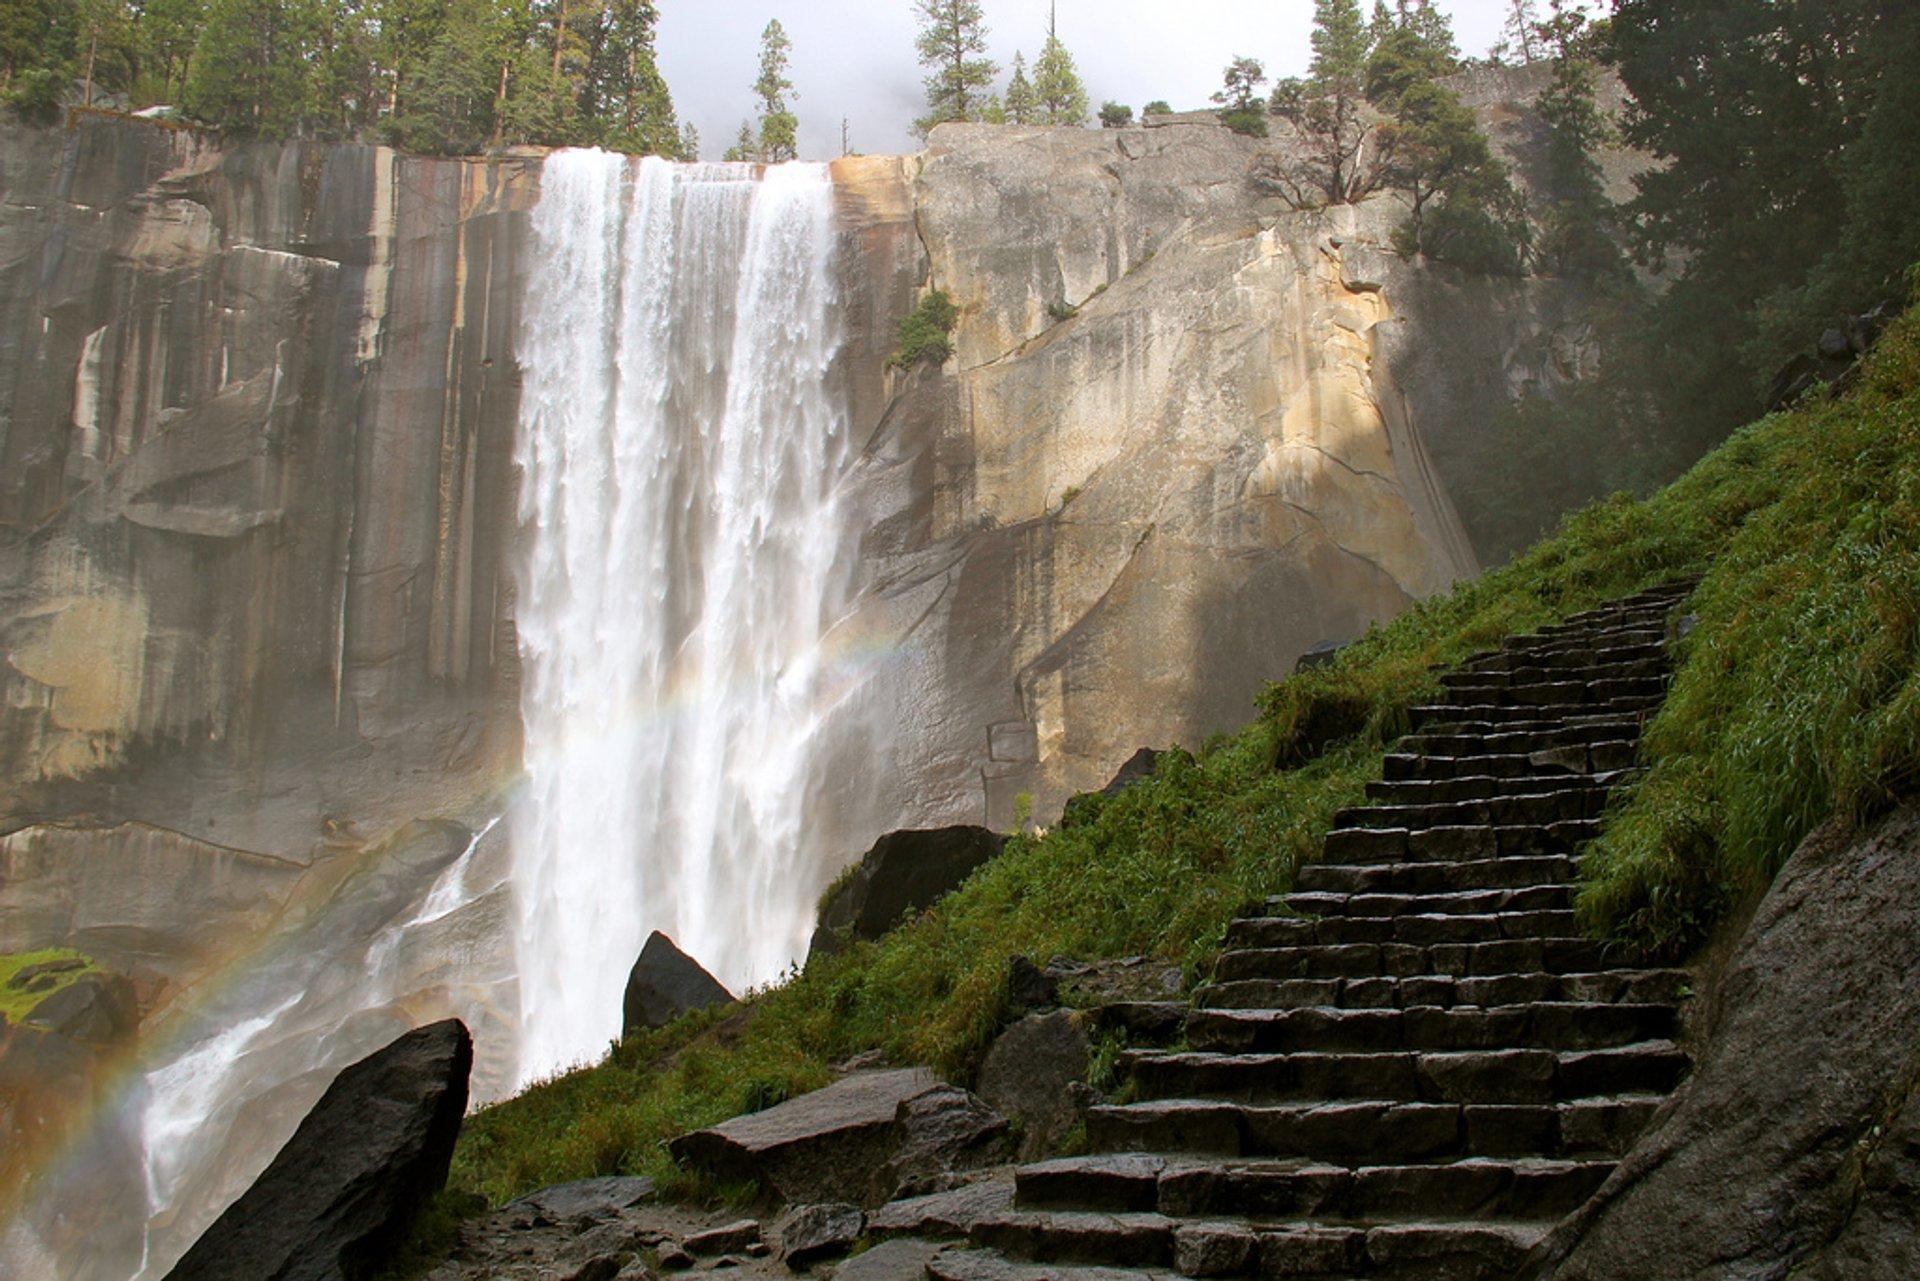 Mist Trail in Yosemite 2020 - Best Time